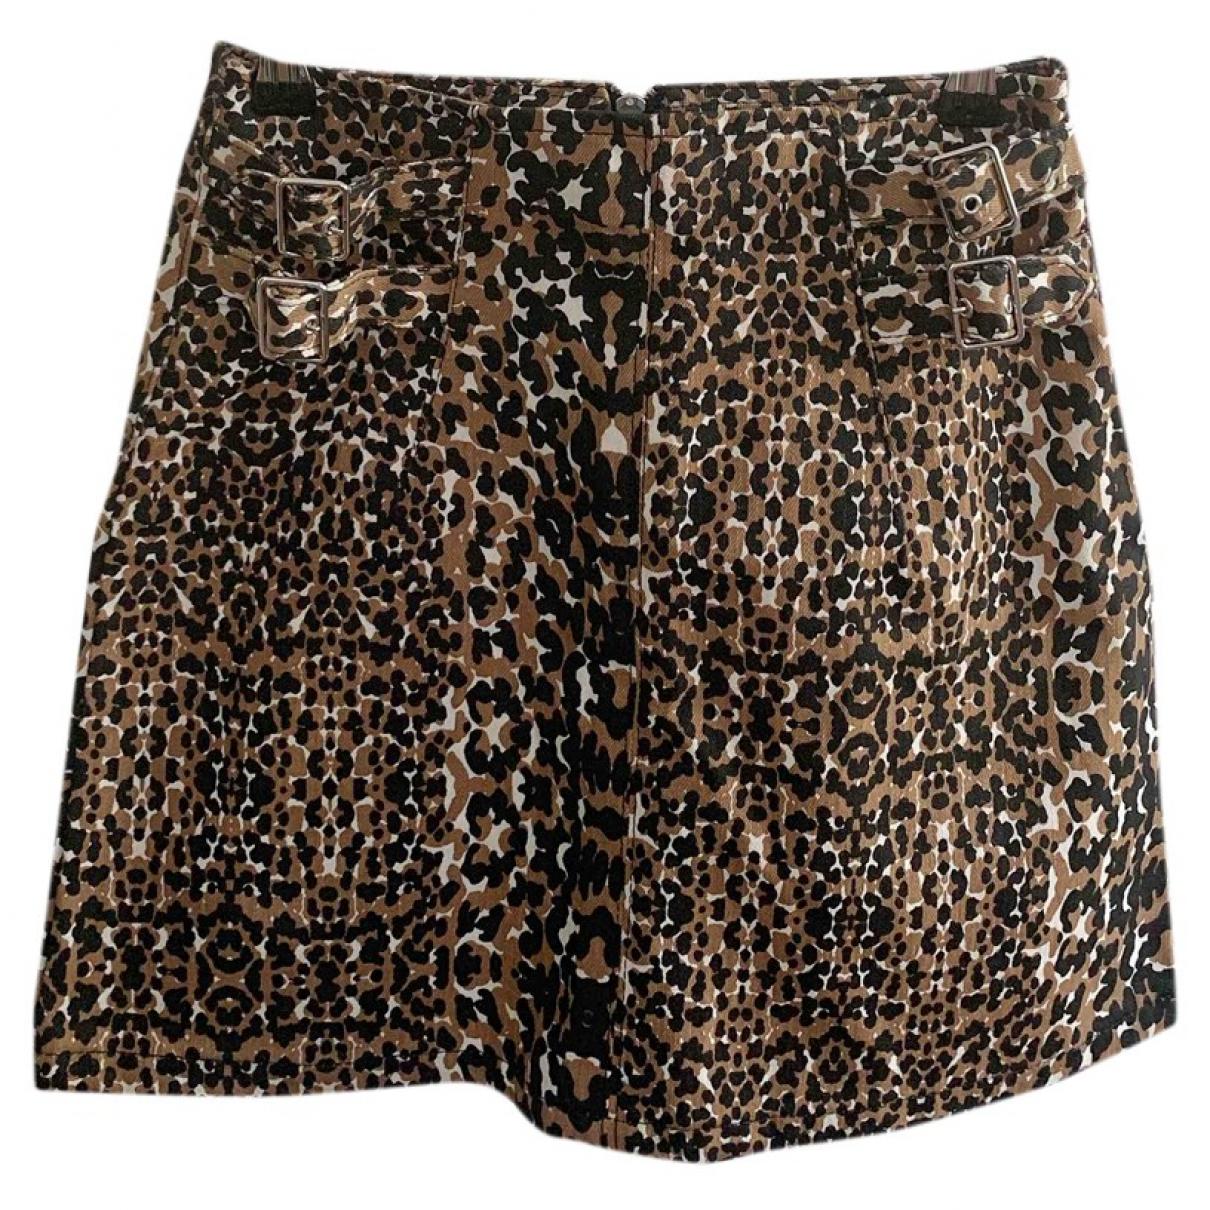 tophop N Multicolour Cotton skirt for Women 8 UK